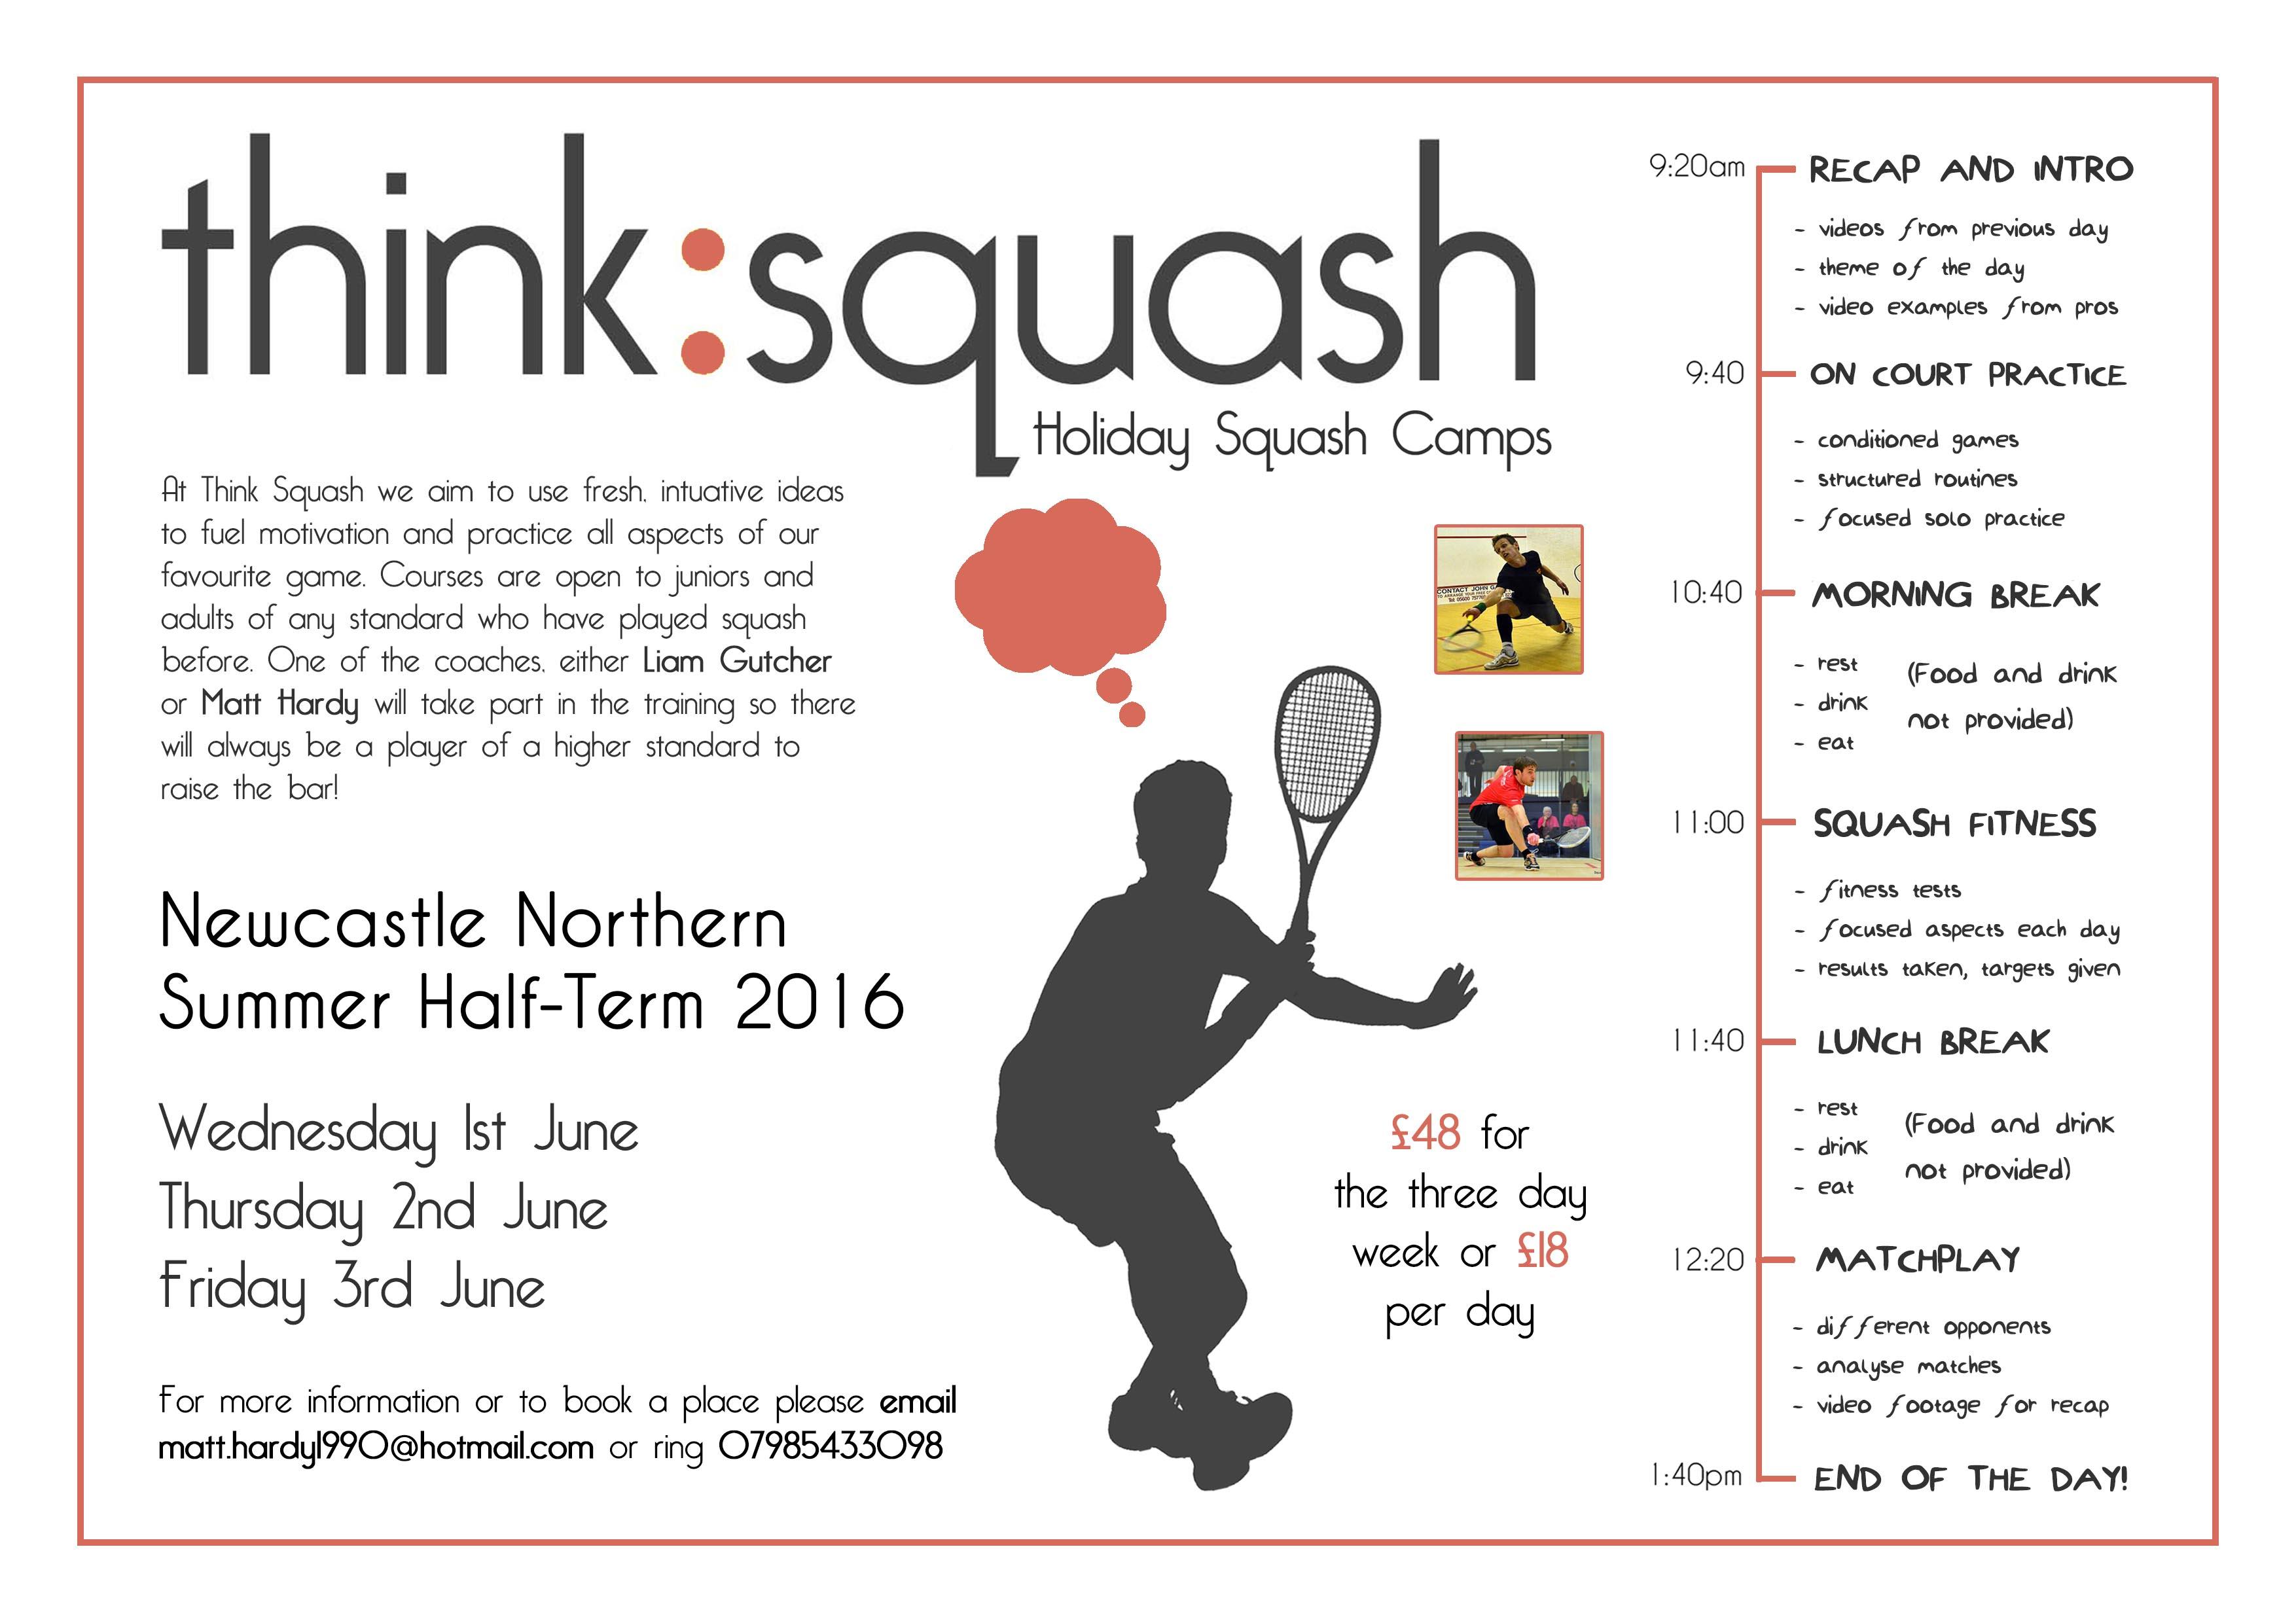 thinkSquashHalfTermJune16